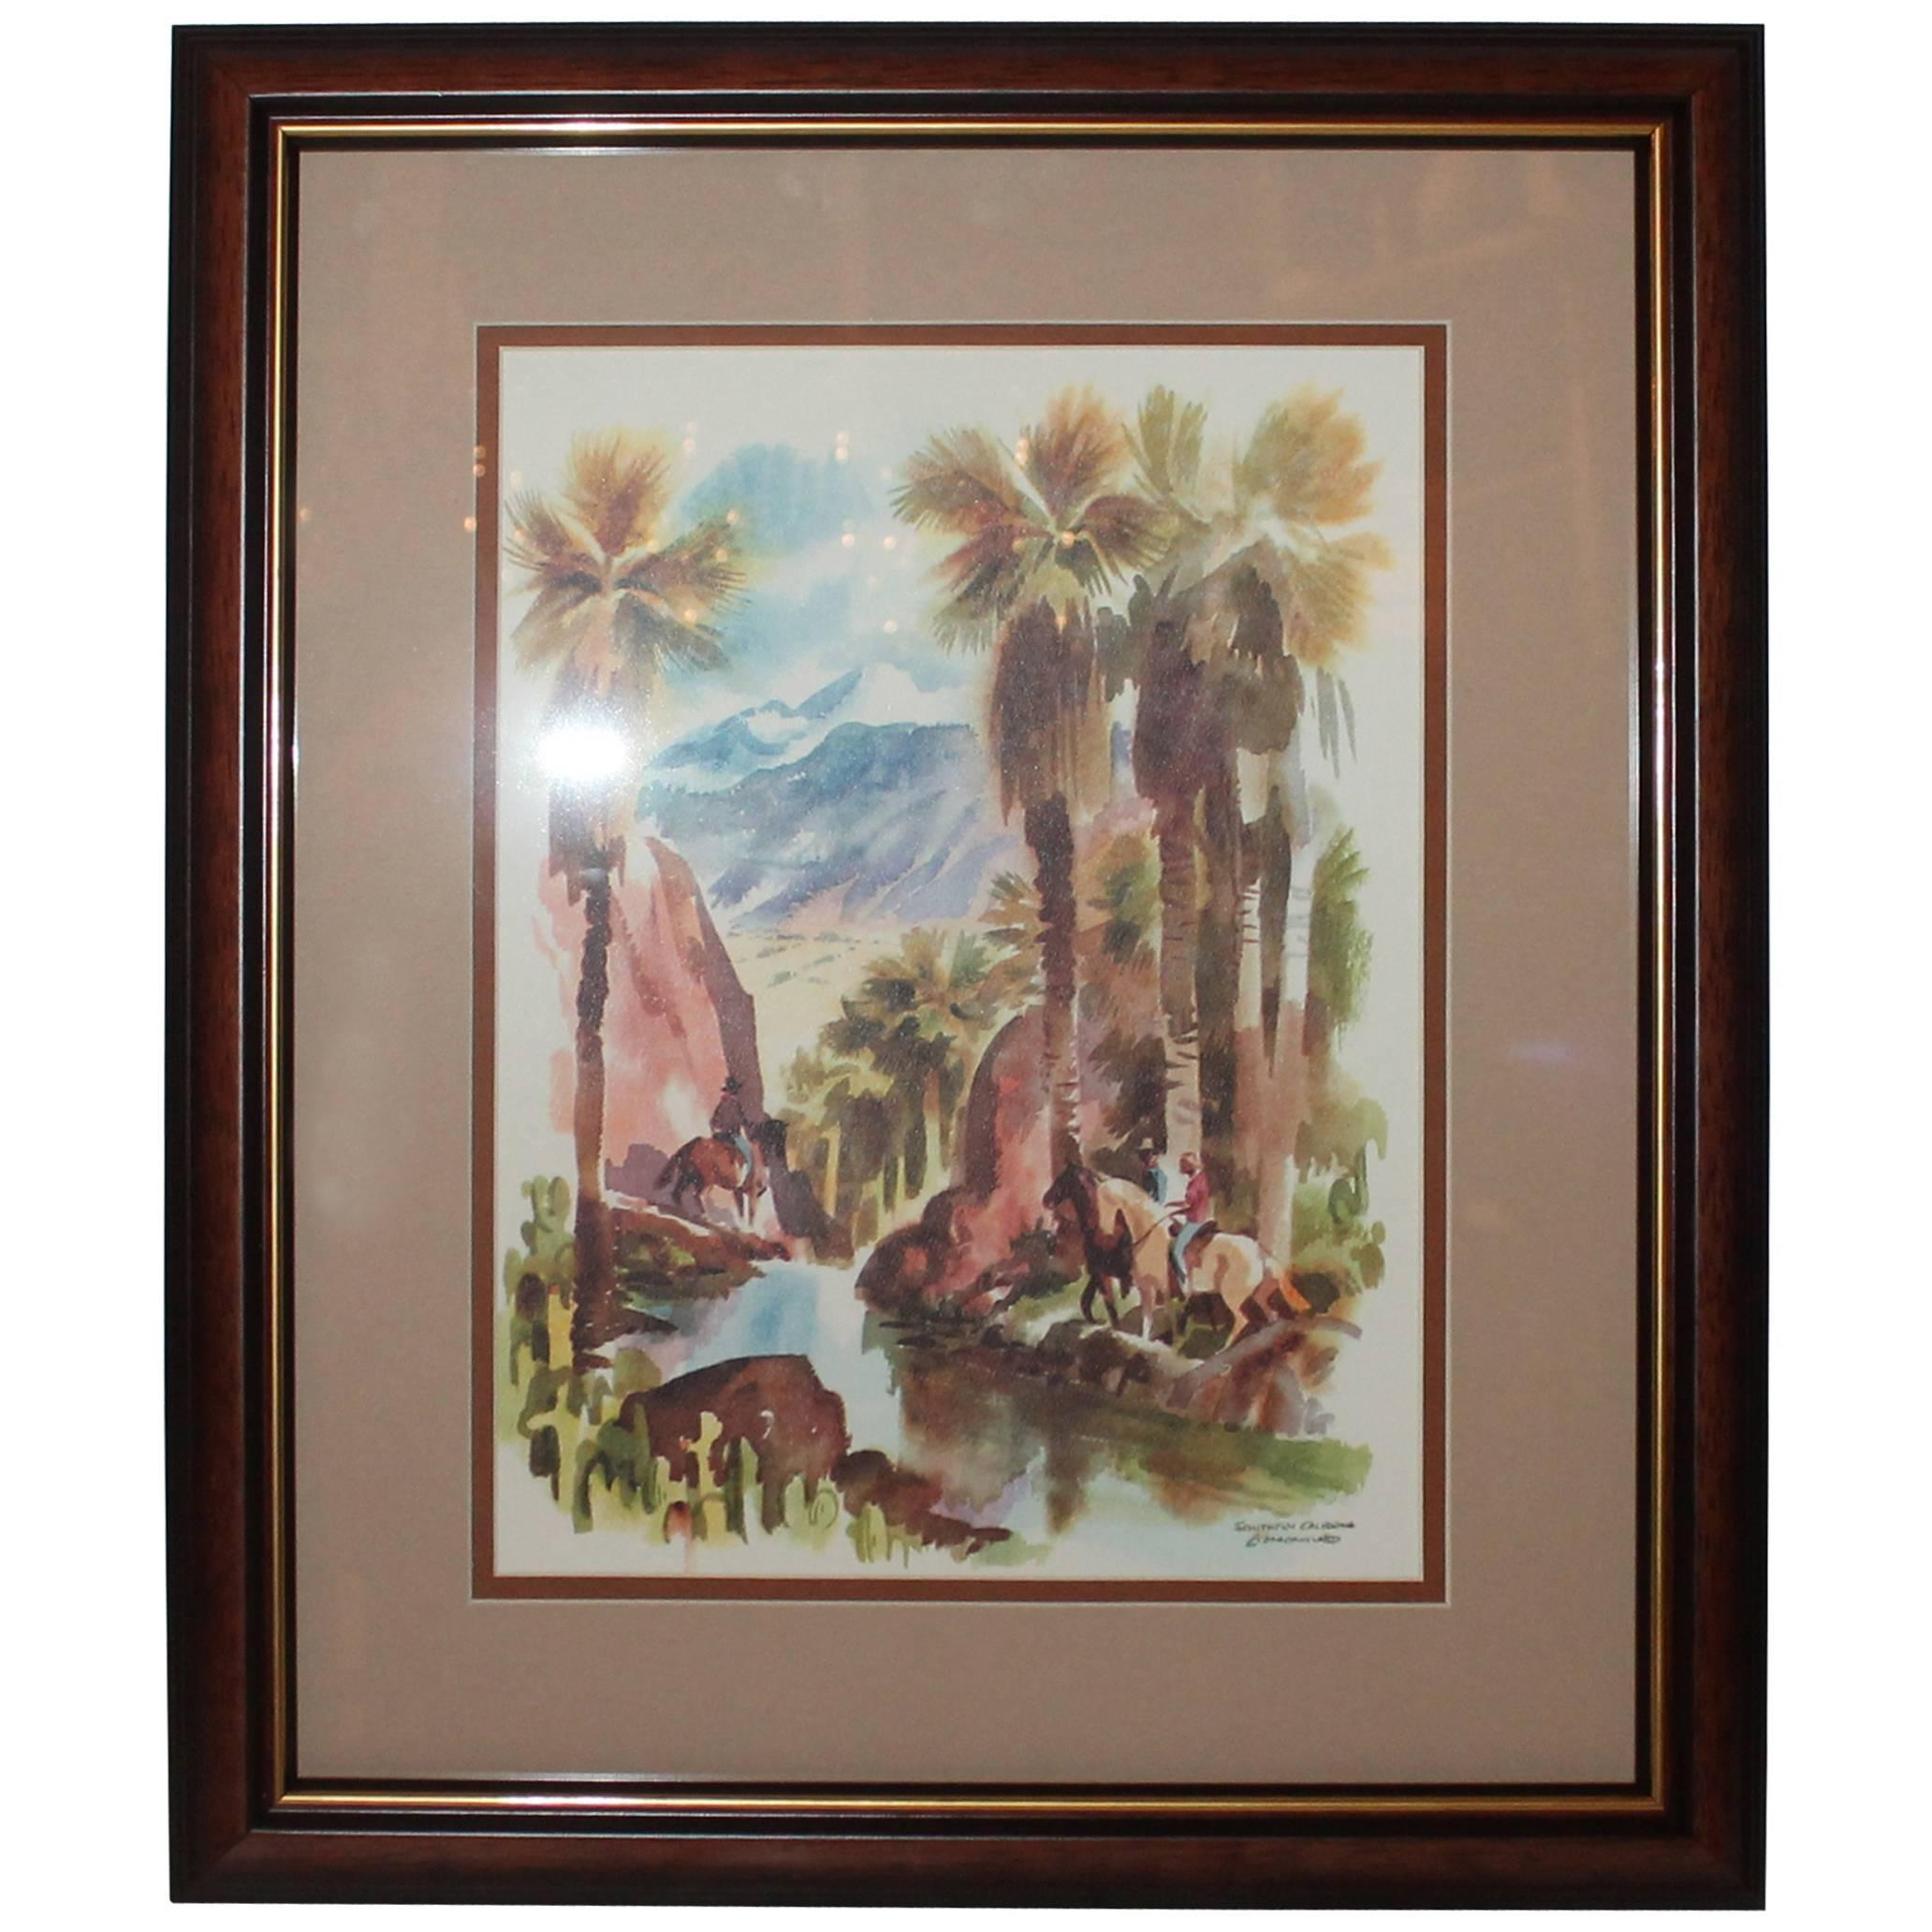 Signed C. Macourlard San Francisco Watercolor